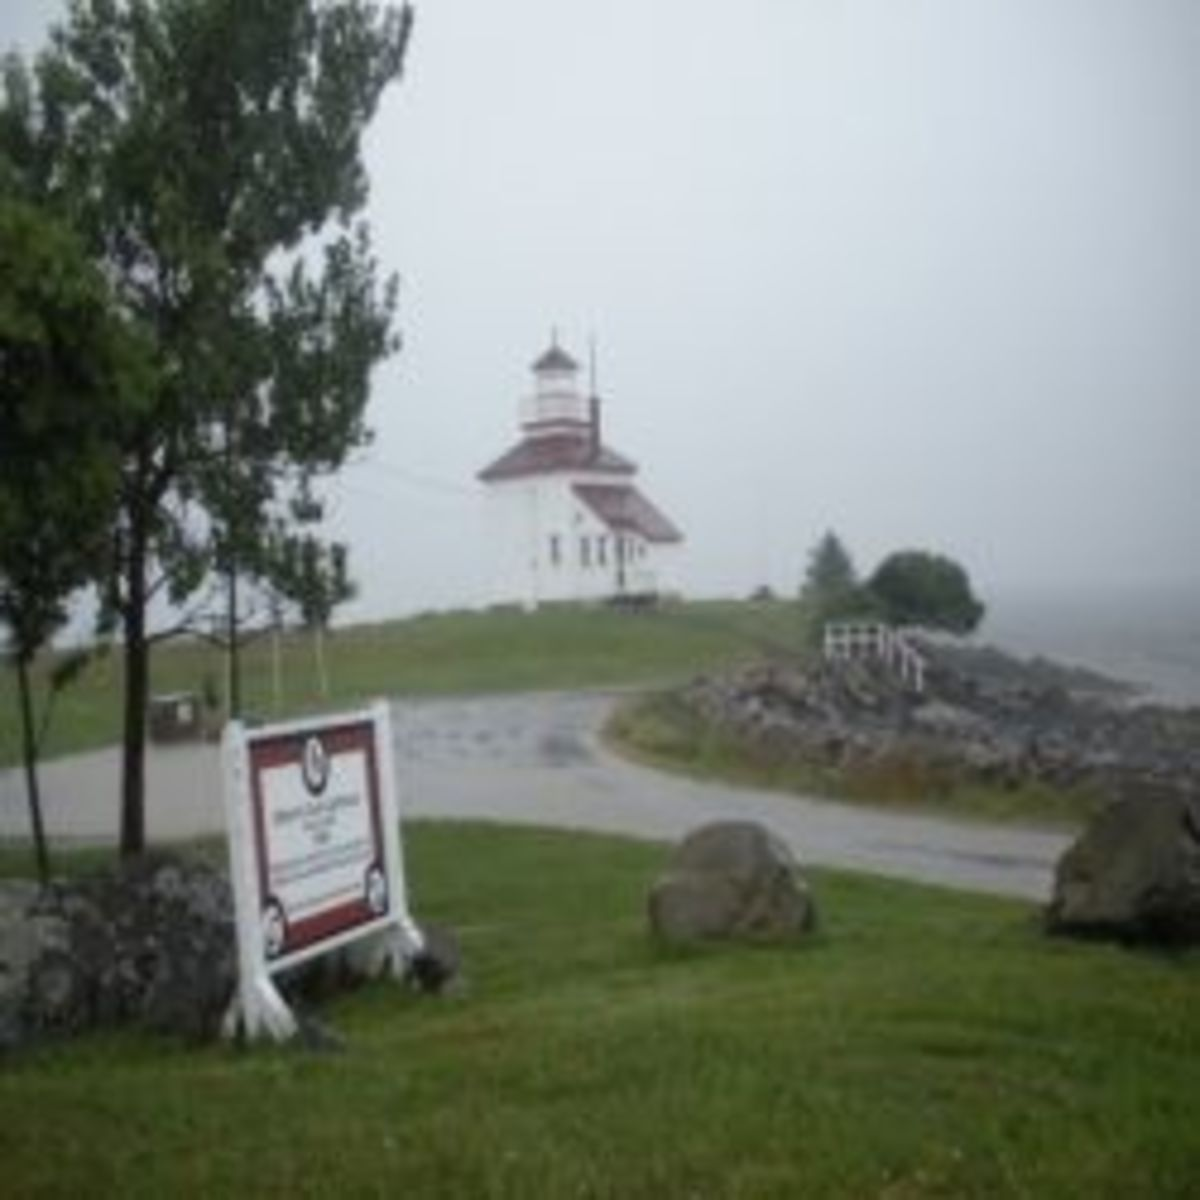 Gilbert's Cove Lighthouse Nova Scotia